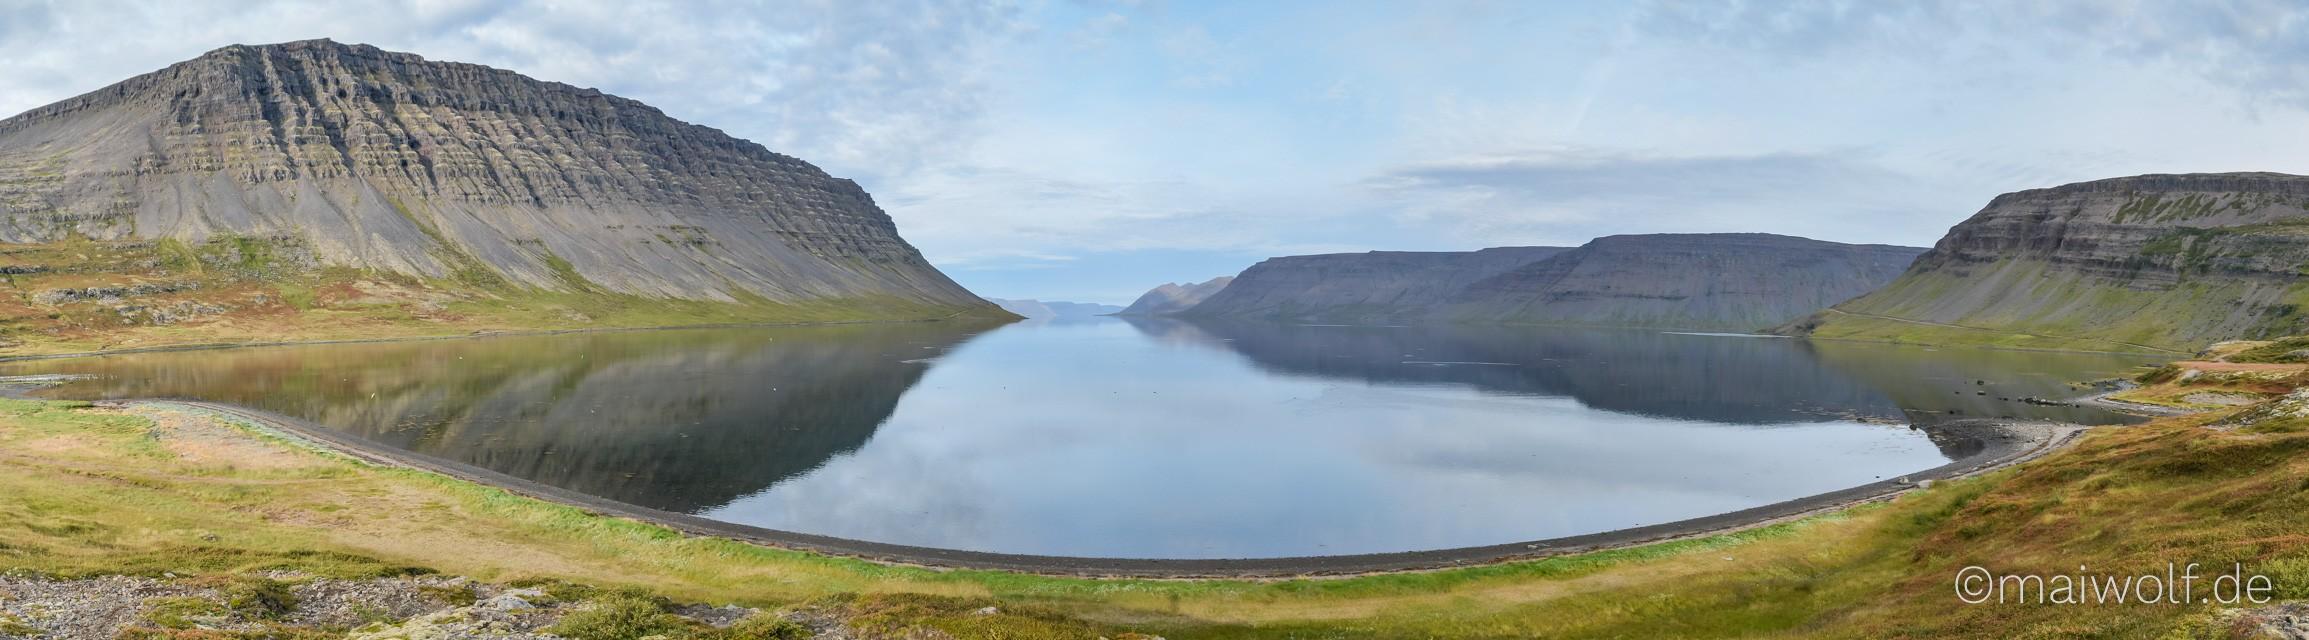 Island pano 021 https://blog.maiwolf.de/island_westfjorde/